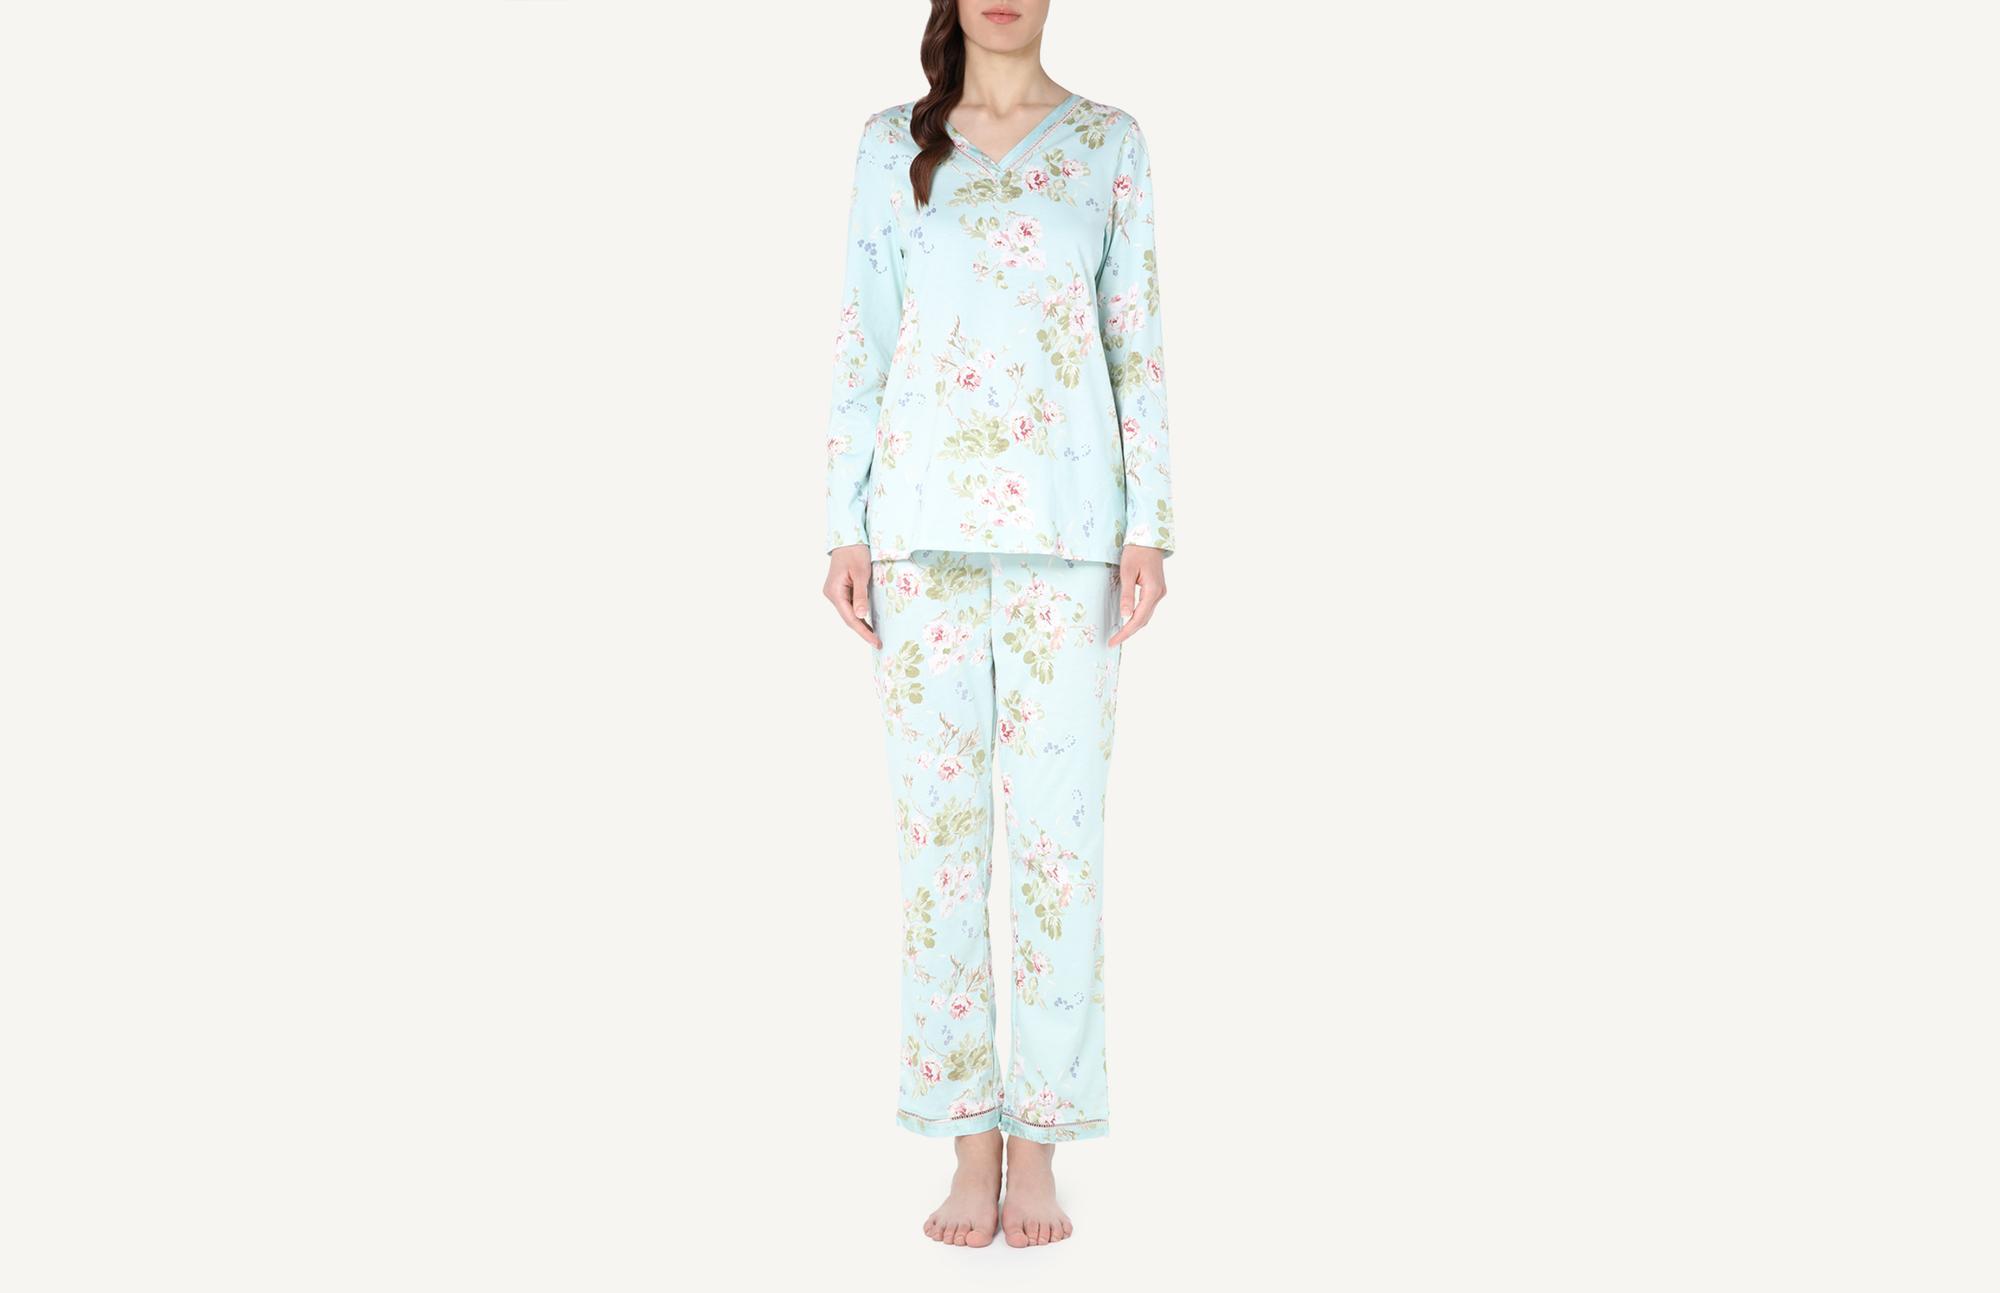 909f88f00d Delicate Flowers Long Supima Cotton Pyjamas - Intimissimi